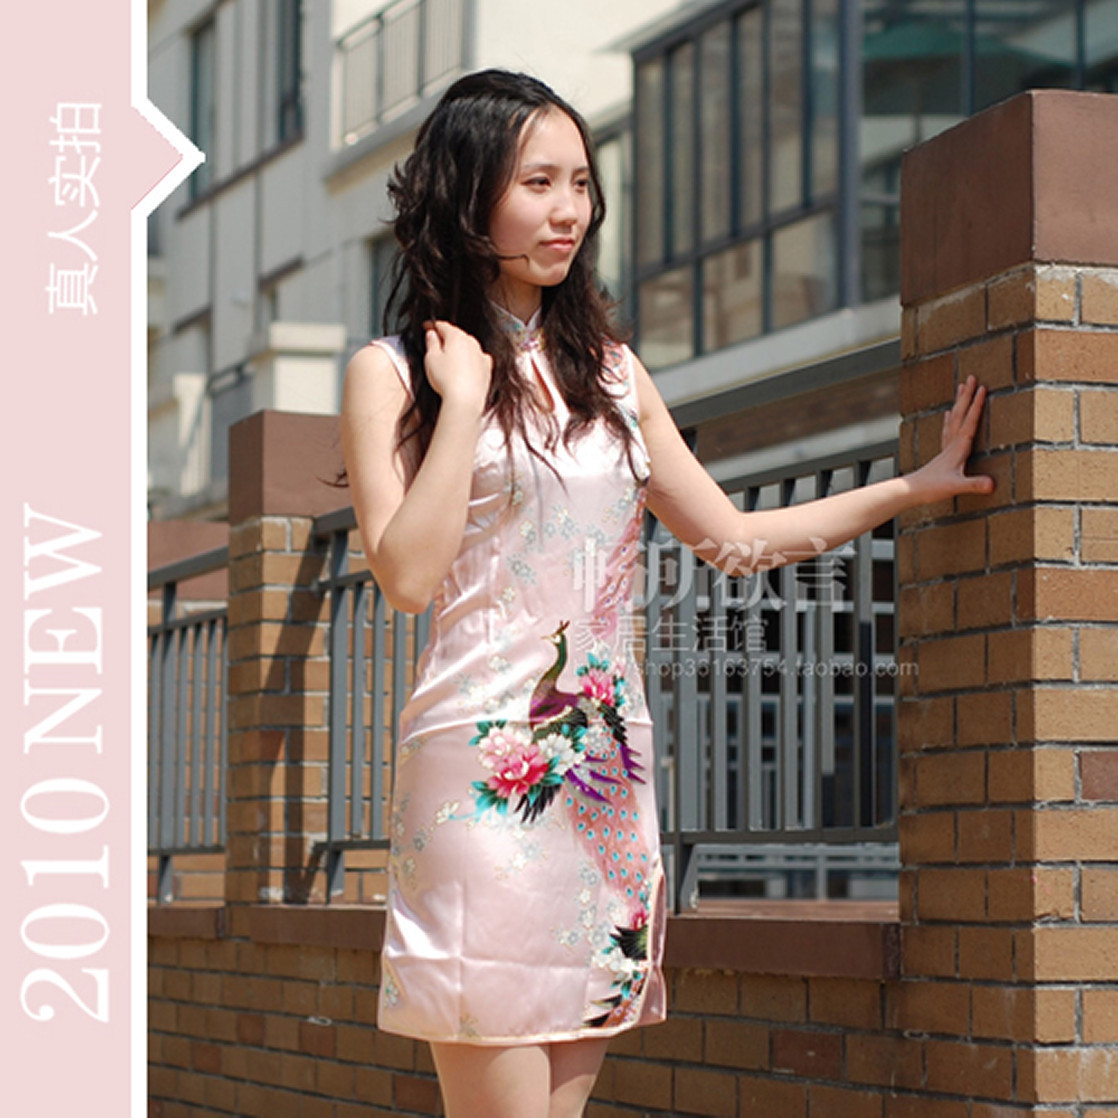 Платье Ципао 滴水旗袍彰显女人气质时尚仿真丝袍盘扣短袖短旗袍孔雀款粉色